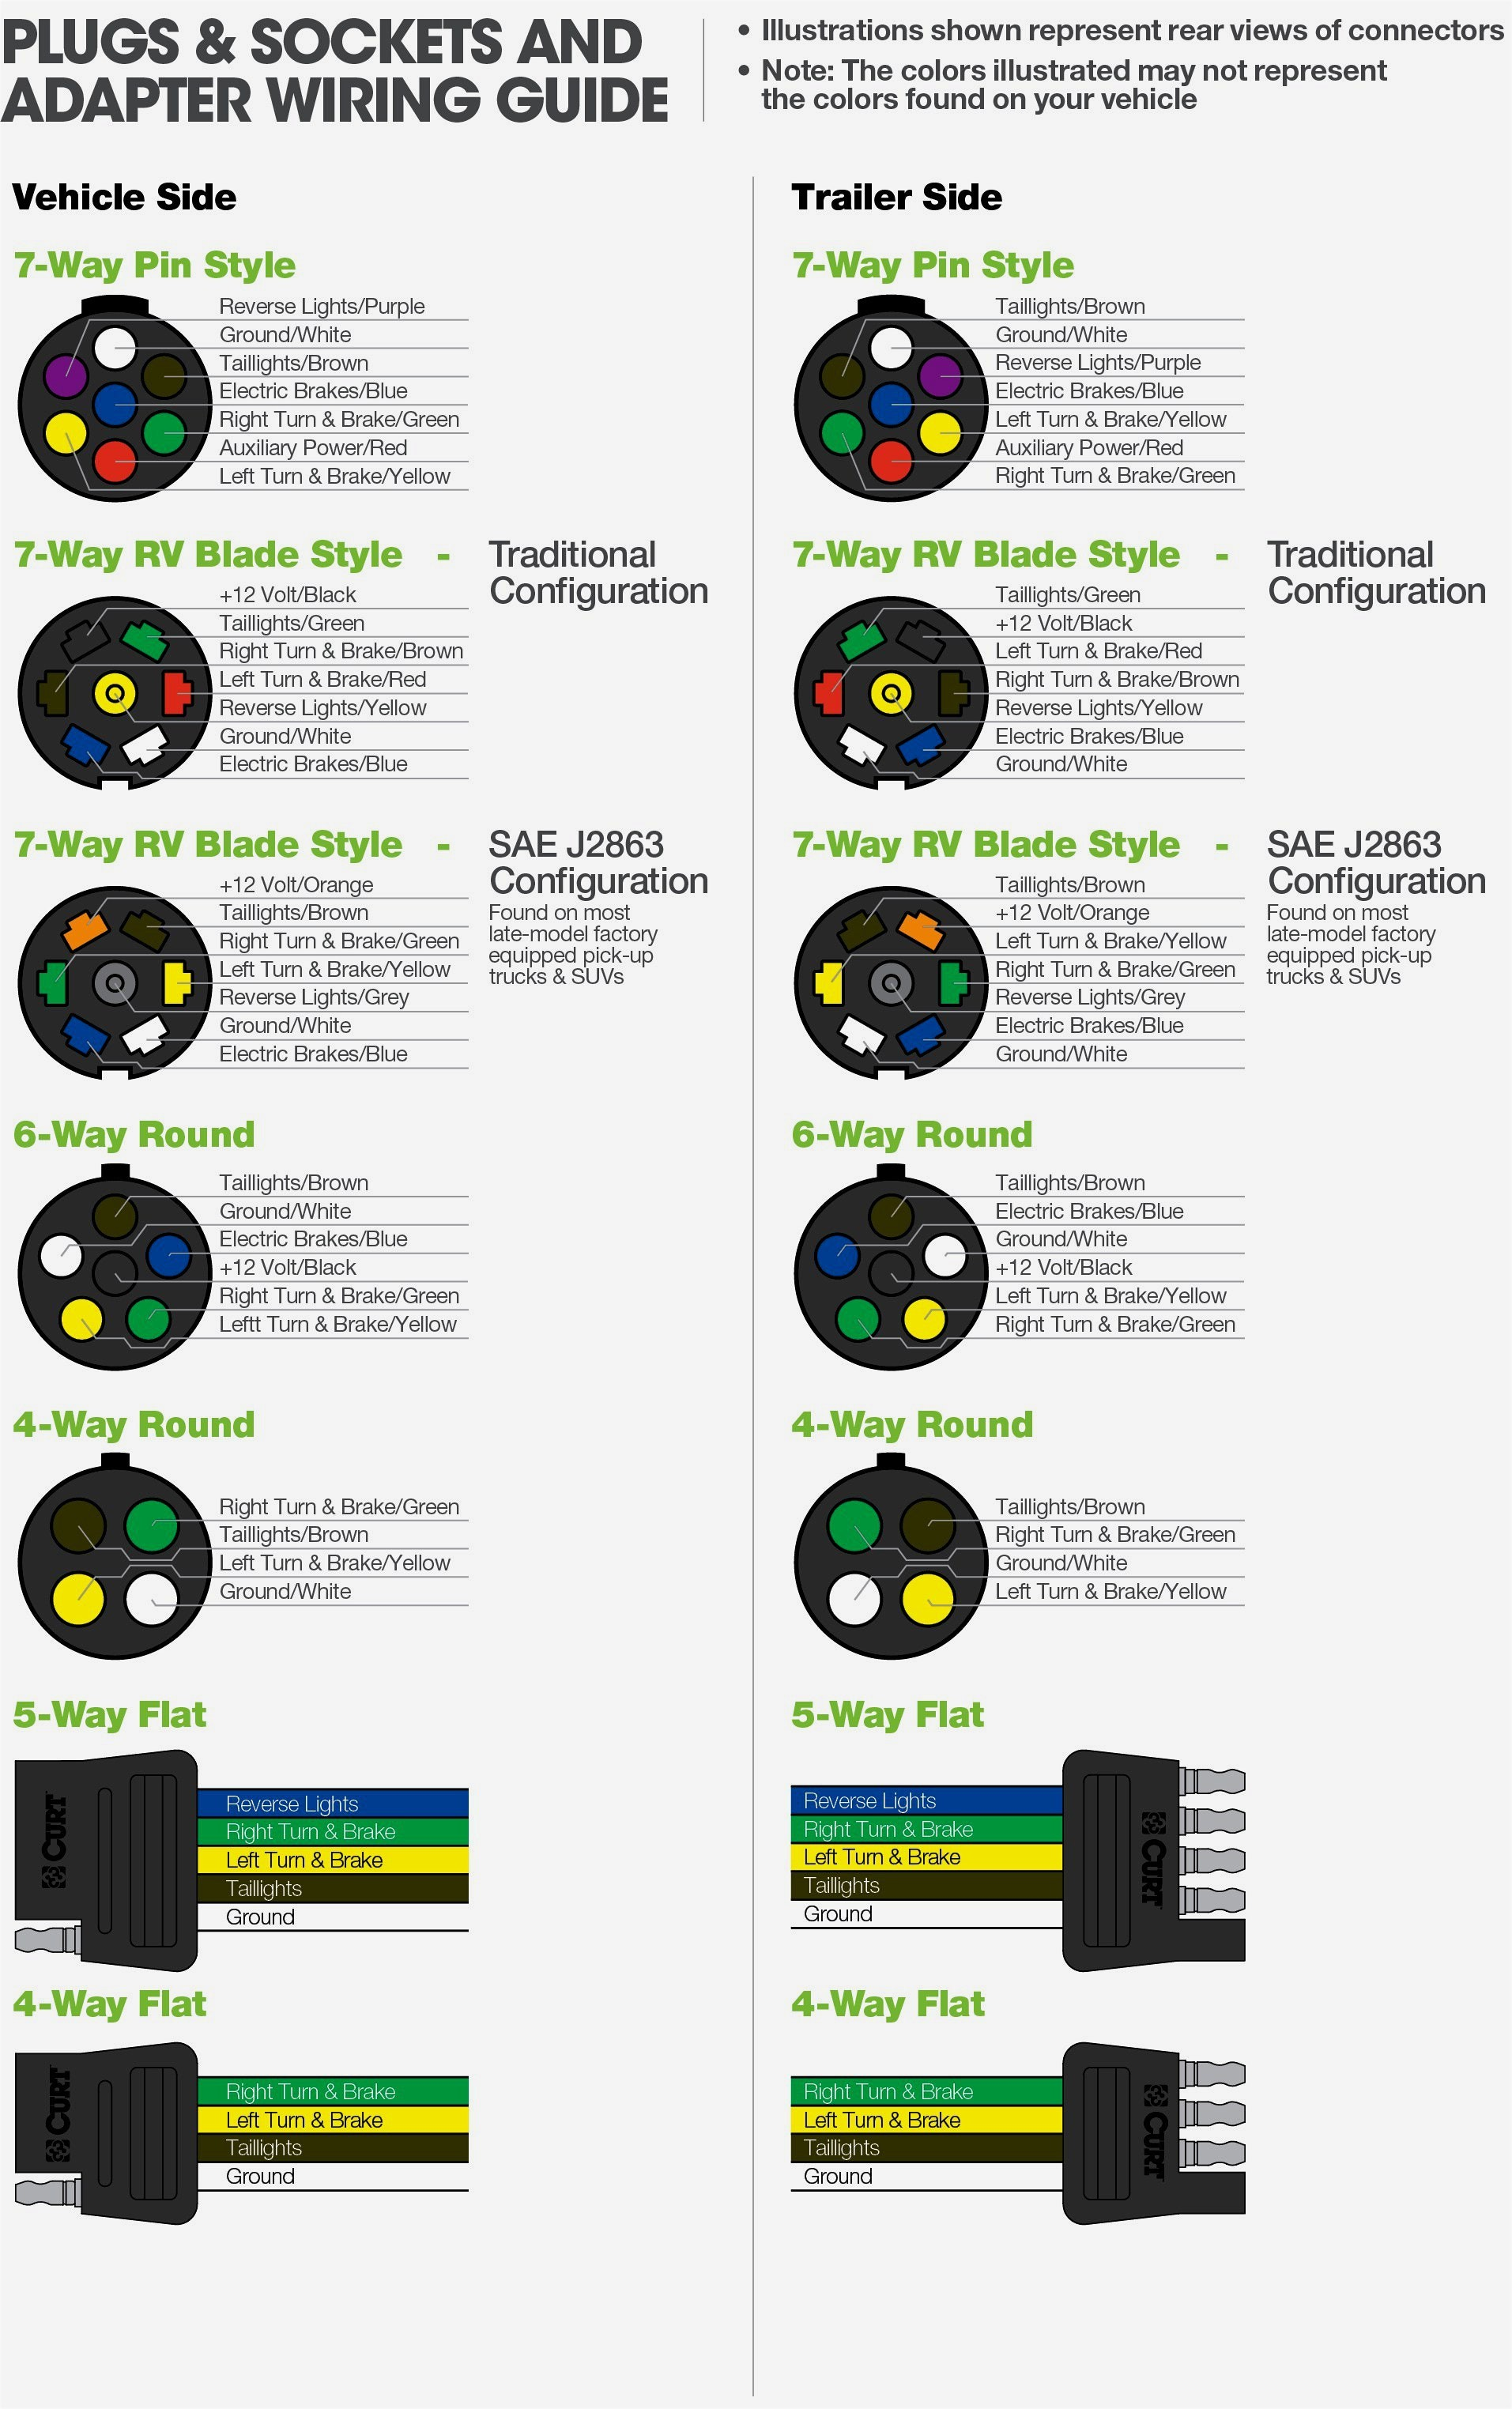 4 Pin to 7 Pin Trailer Adapter Wiring Diagram Lovely Cool 12 Pin Trailer Plug Wiring Electrical Circuit